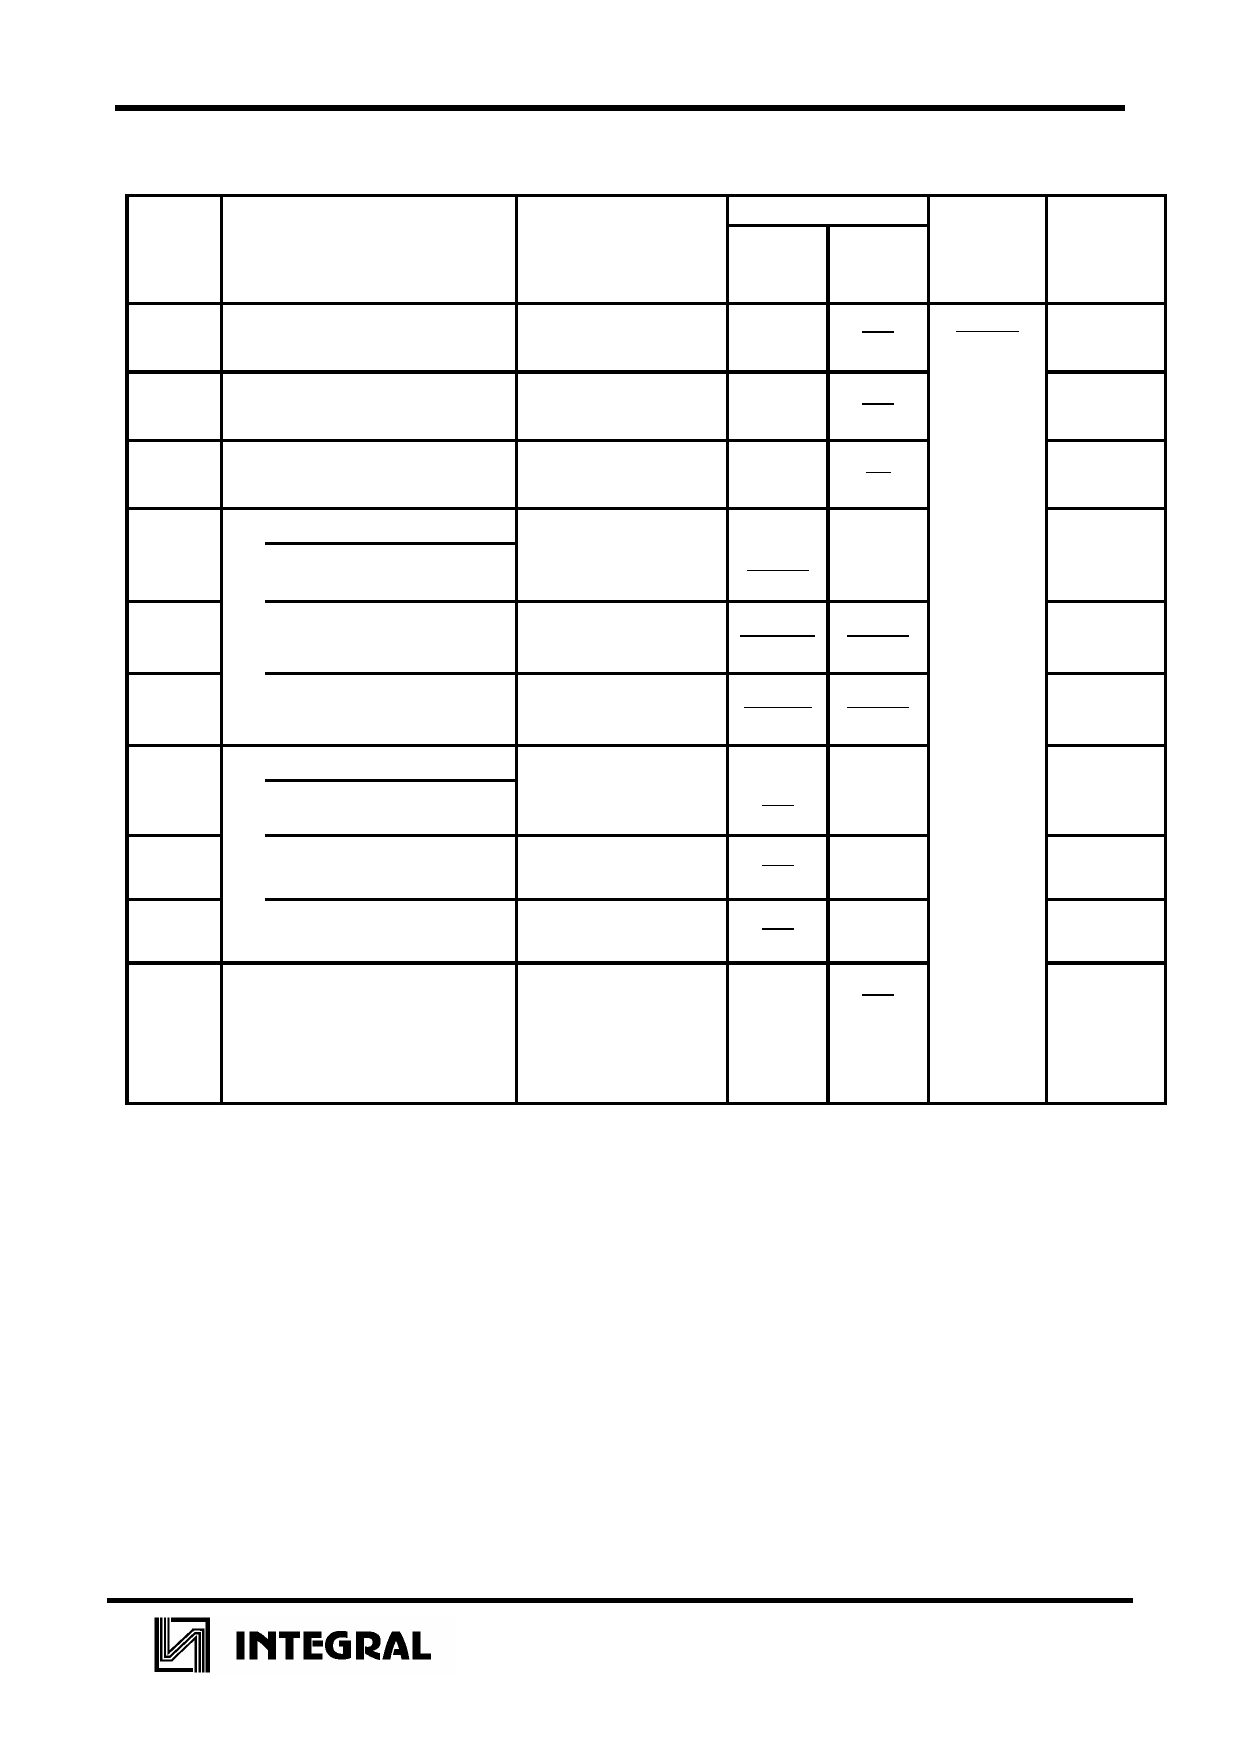 IZ7013 Datasheet, Funktion